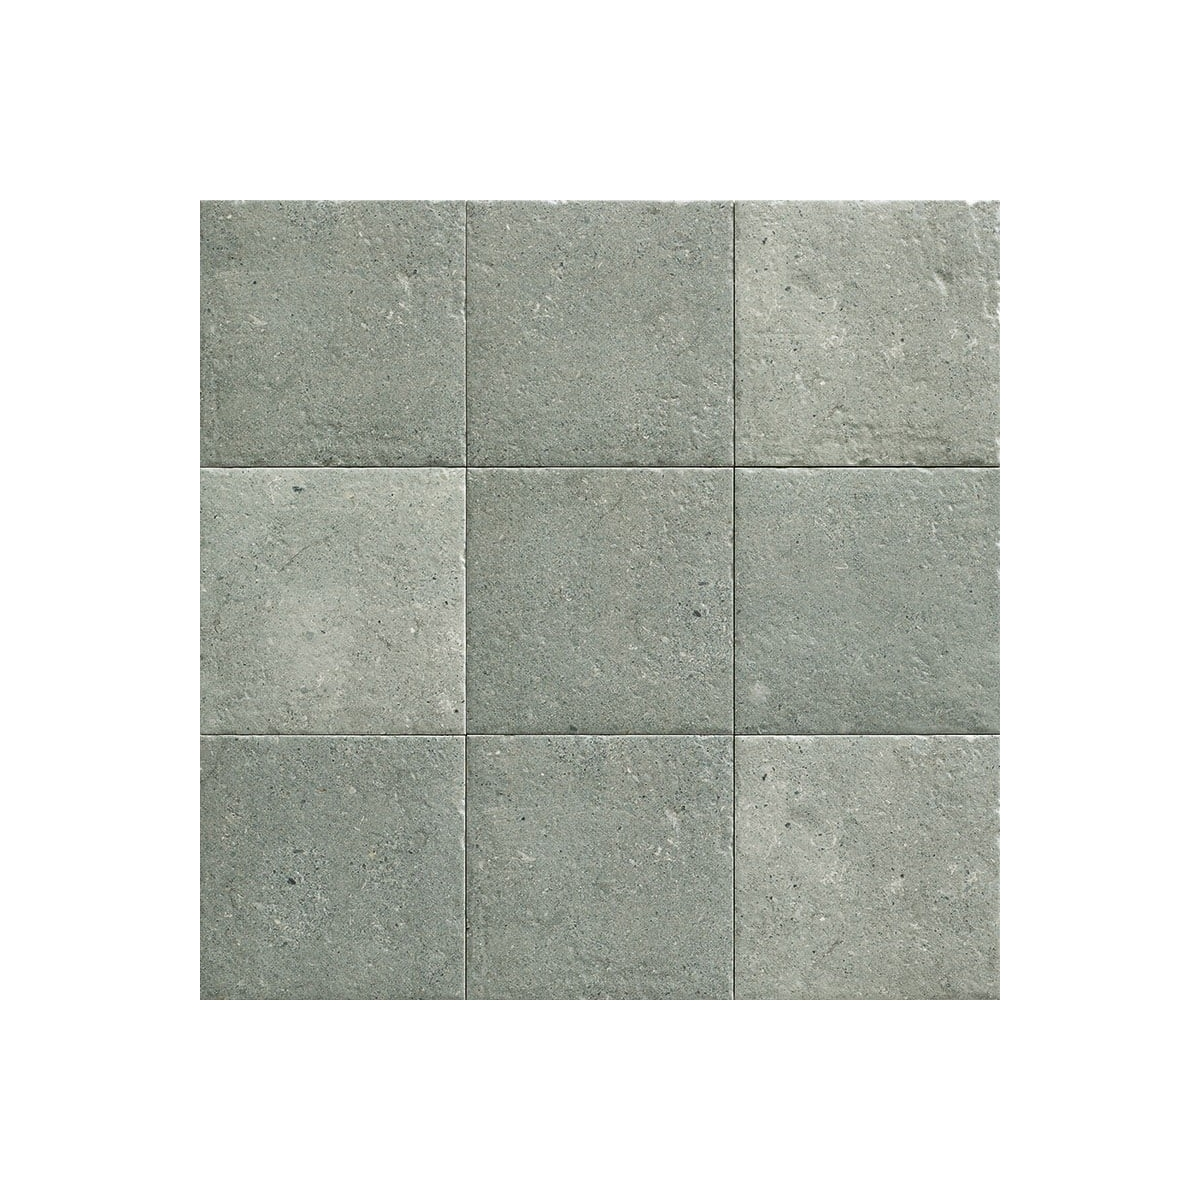 Bali Green Stone 20x20 (caja 1 m2) - Serie Bali Stones - Marca Mainzu